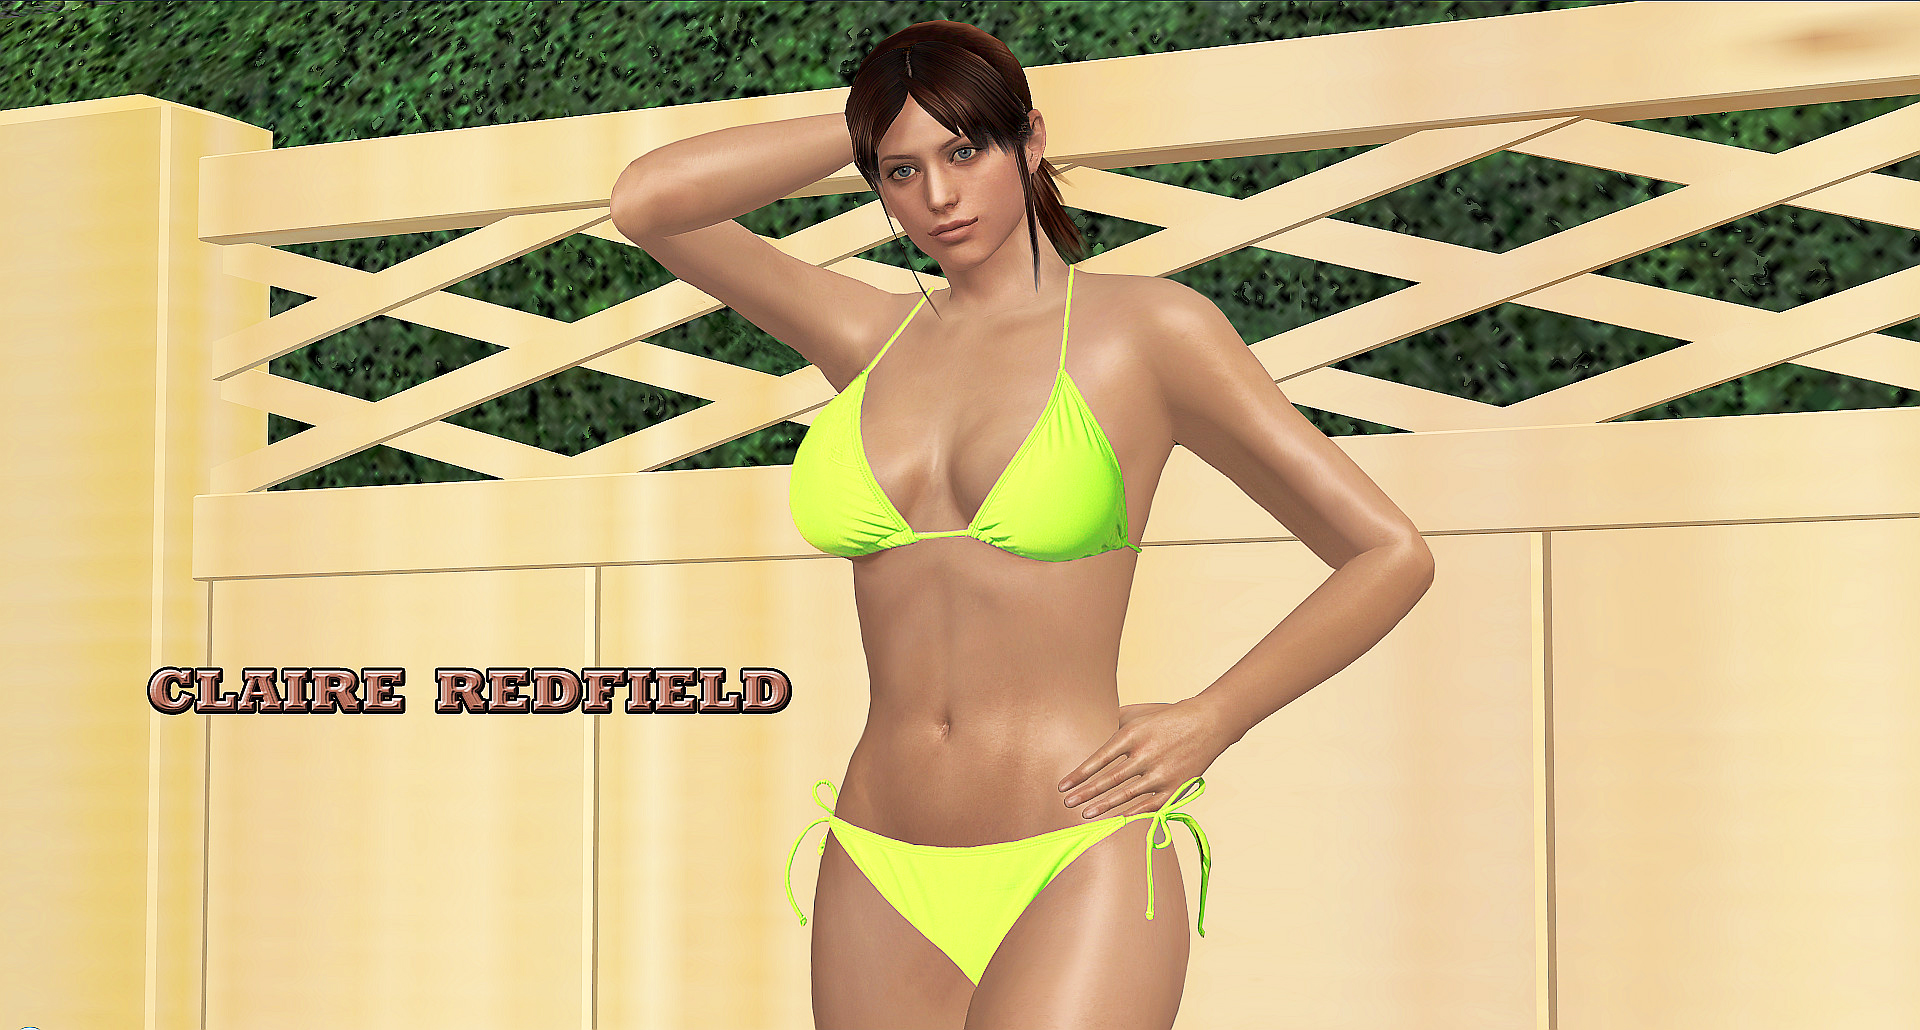 Claire Redfield BIKINI WP By Blw7920 On DeviantArt